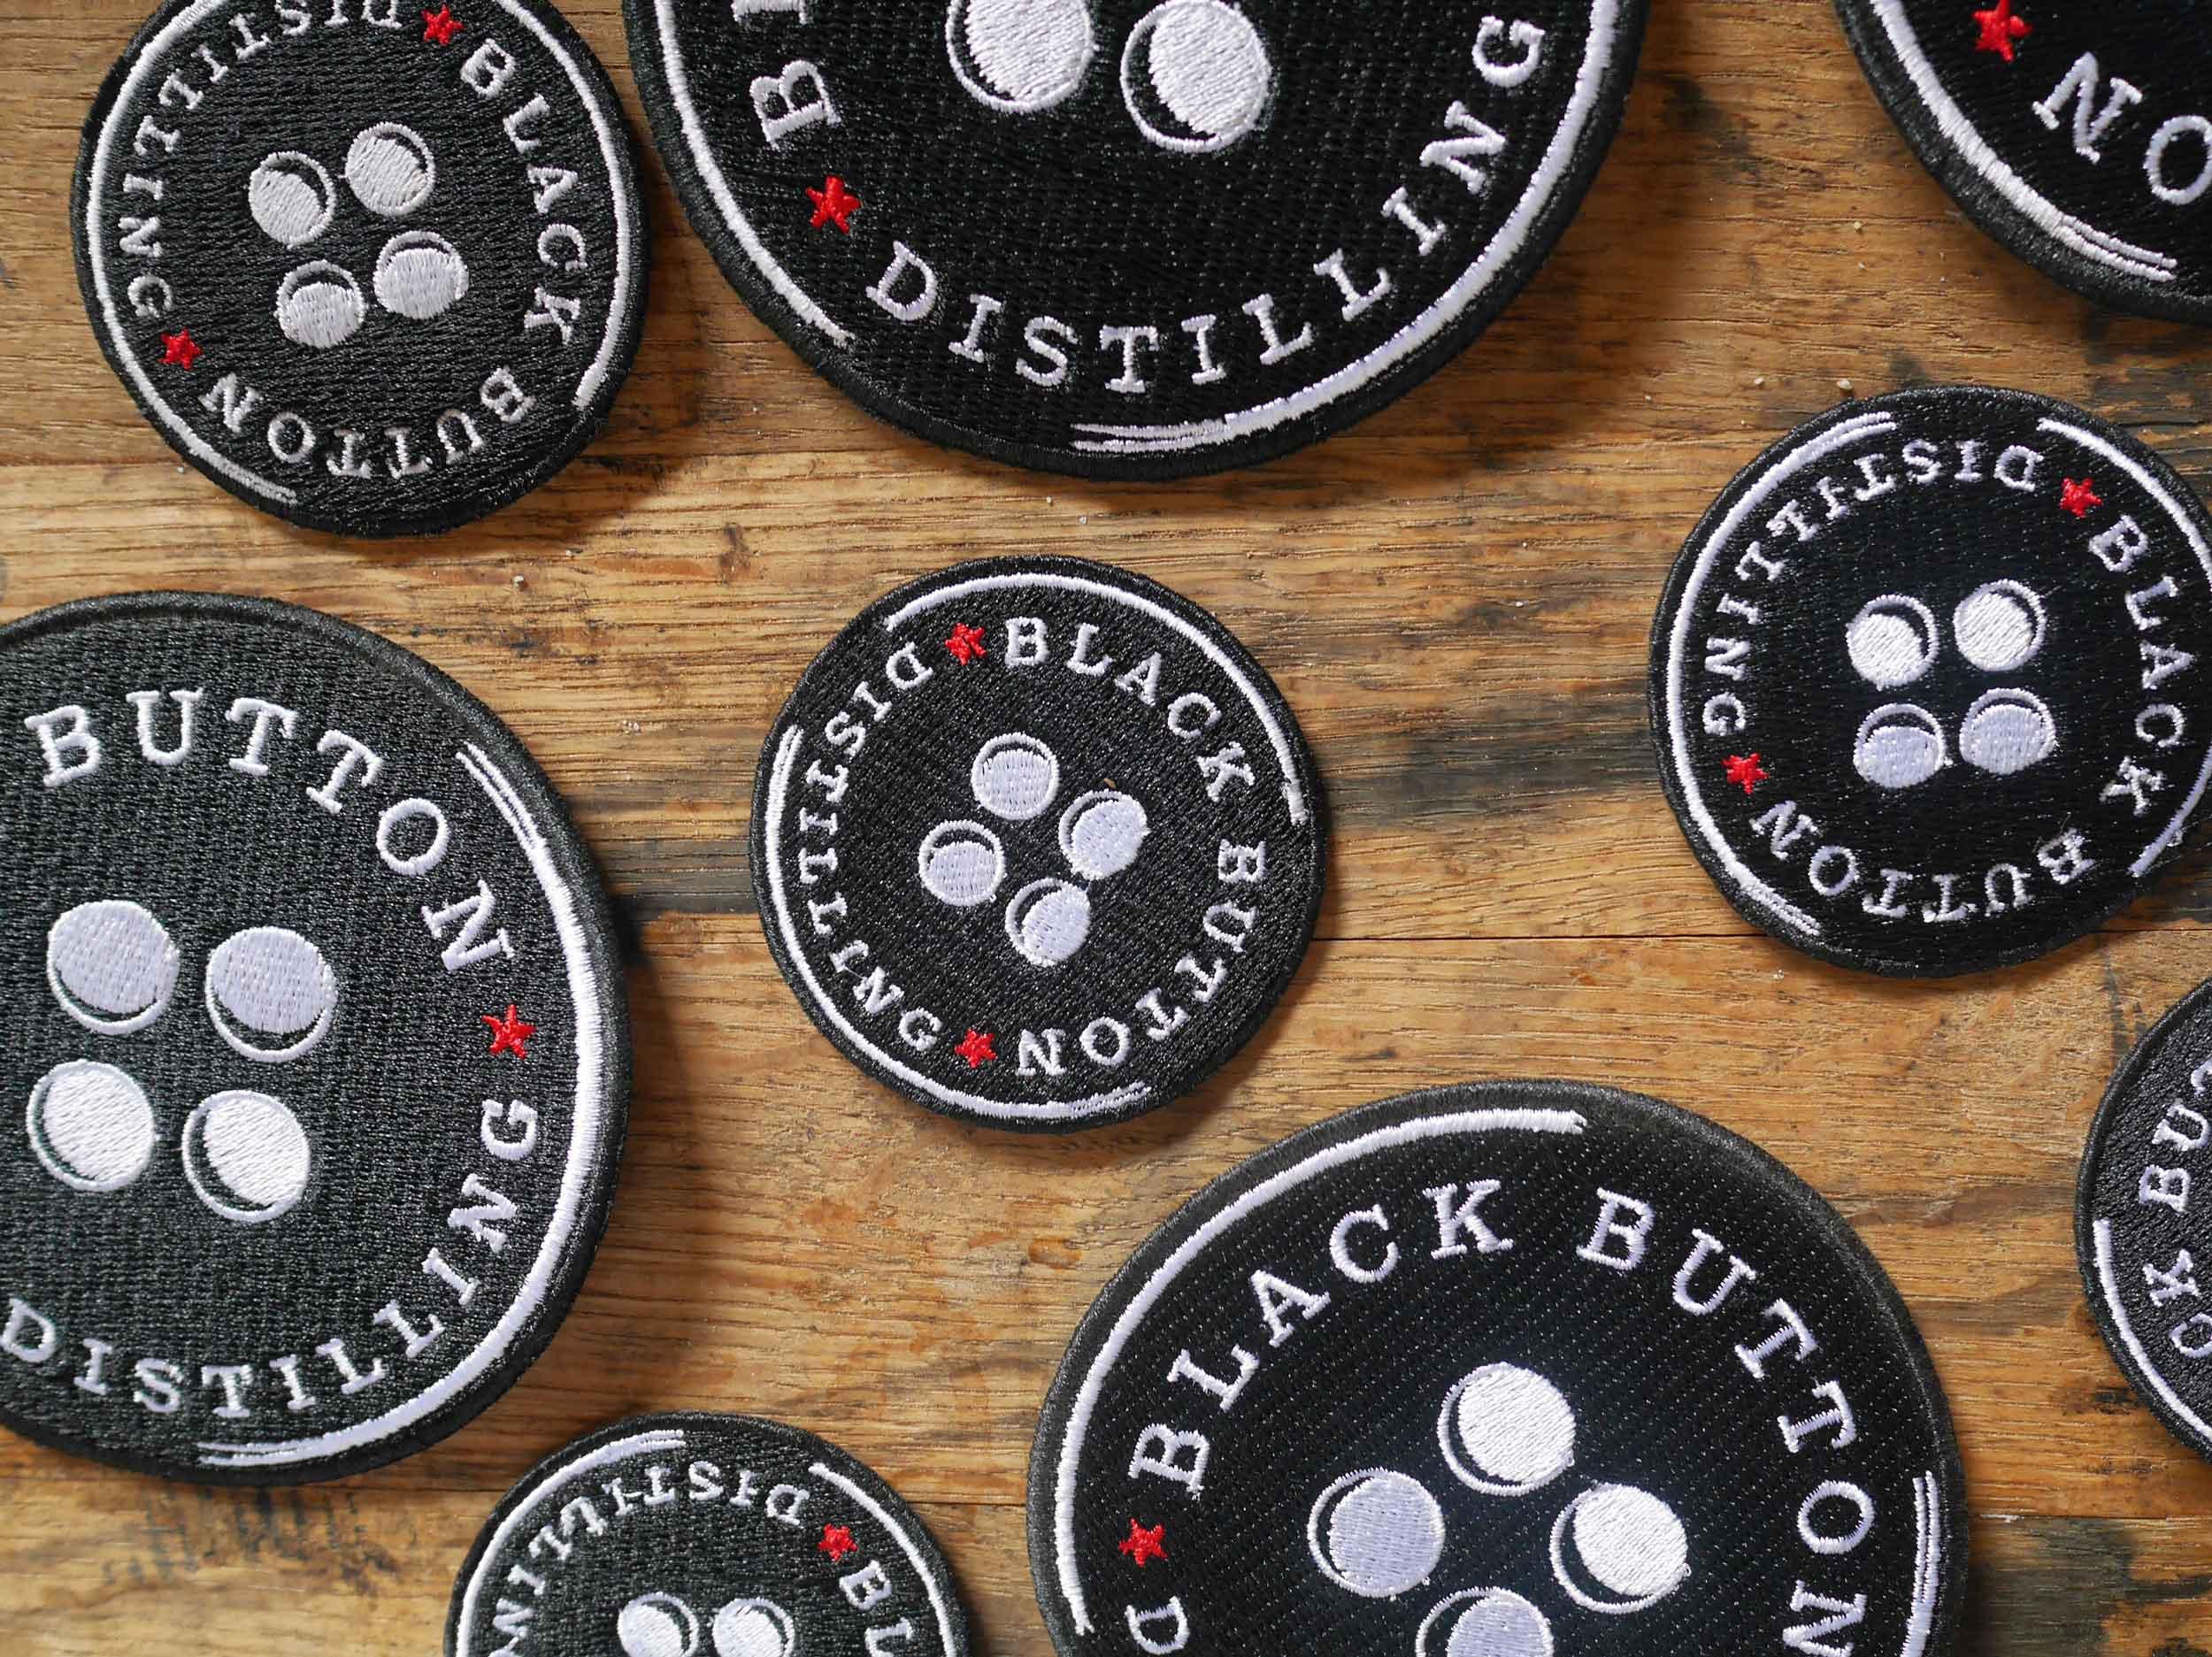 Black Button Distilling Patches